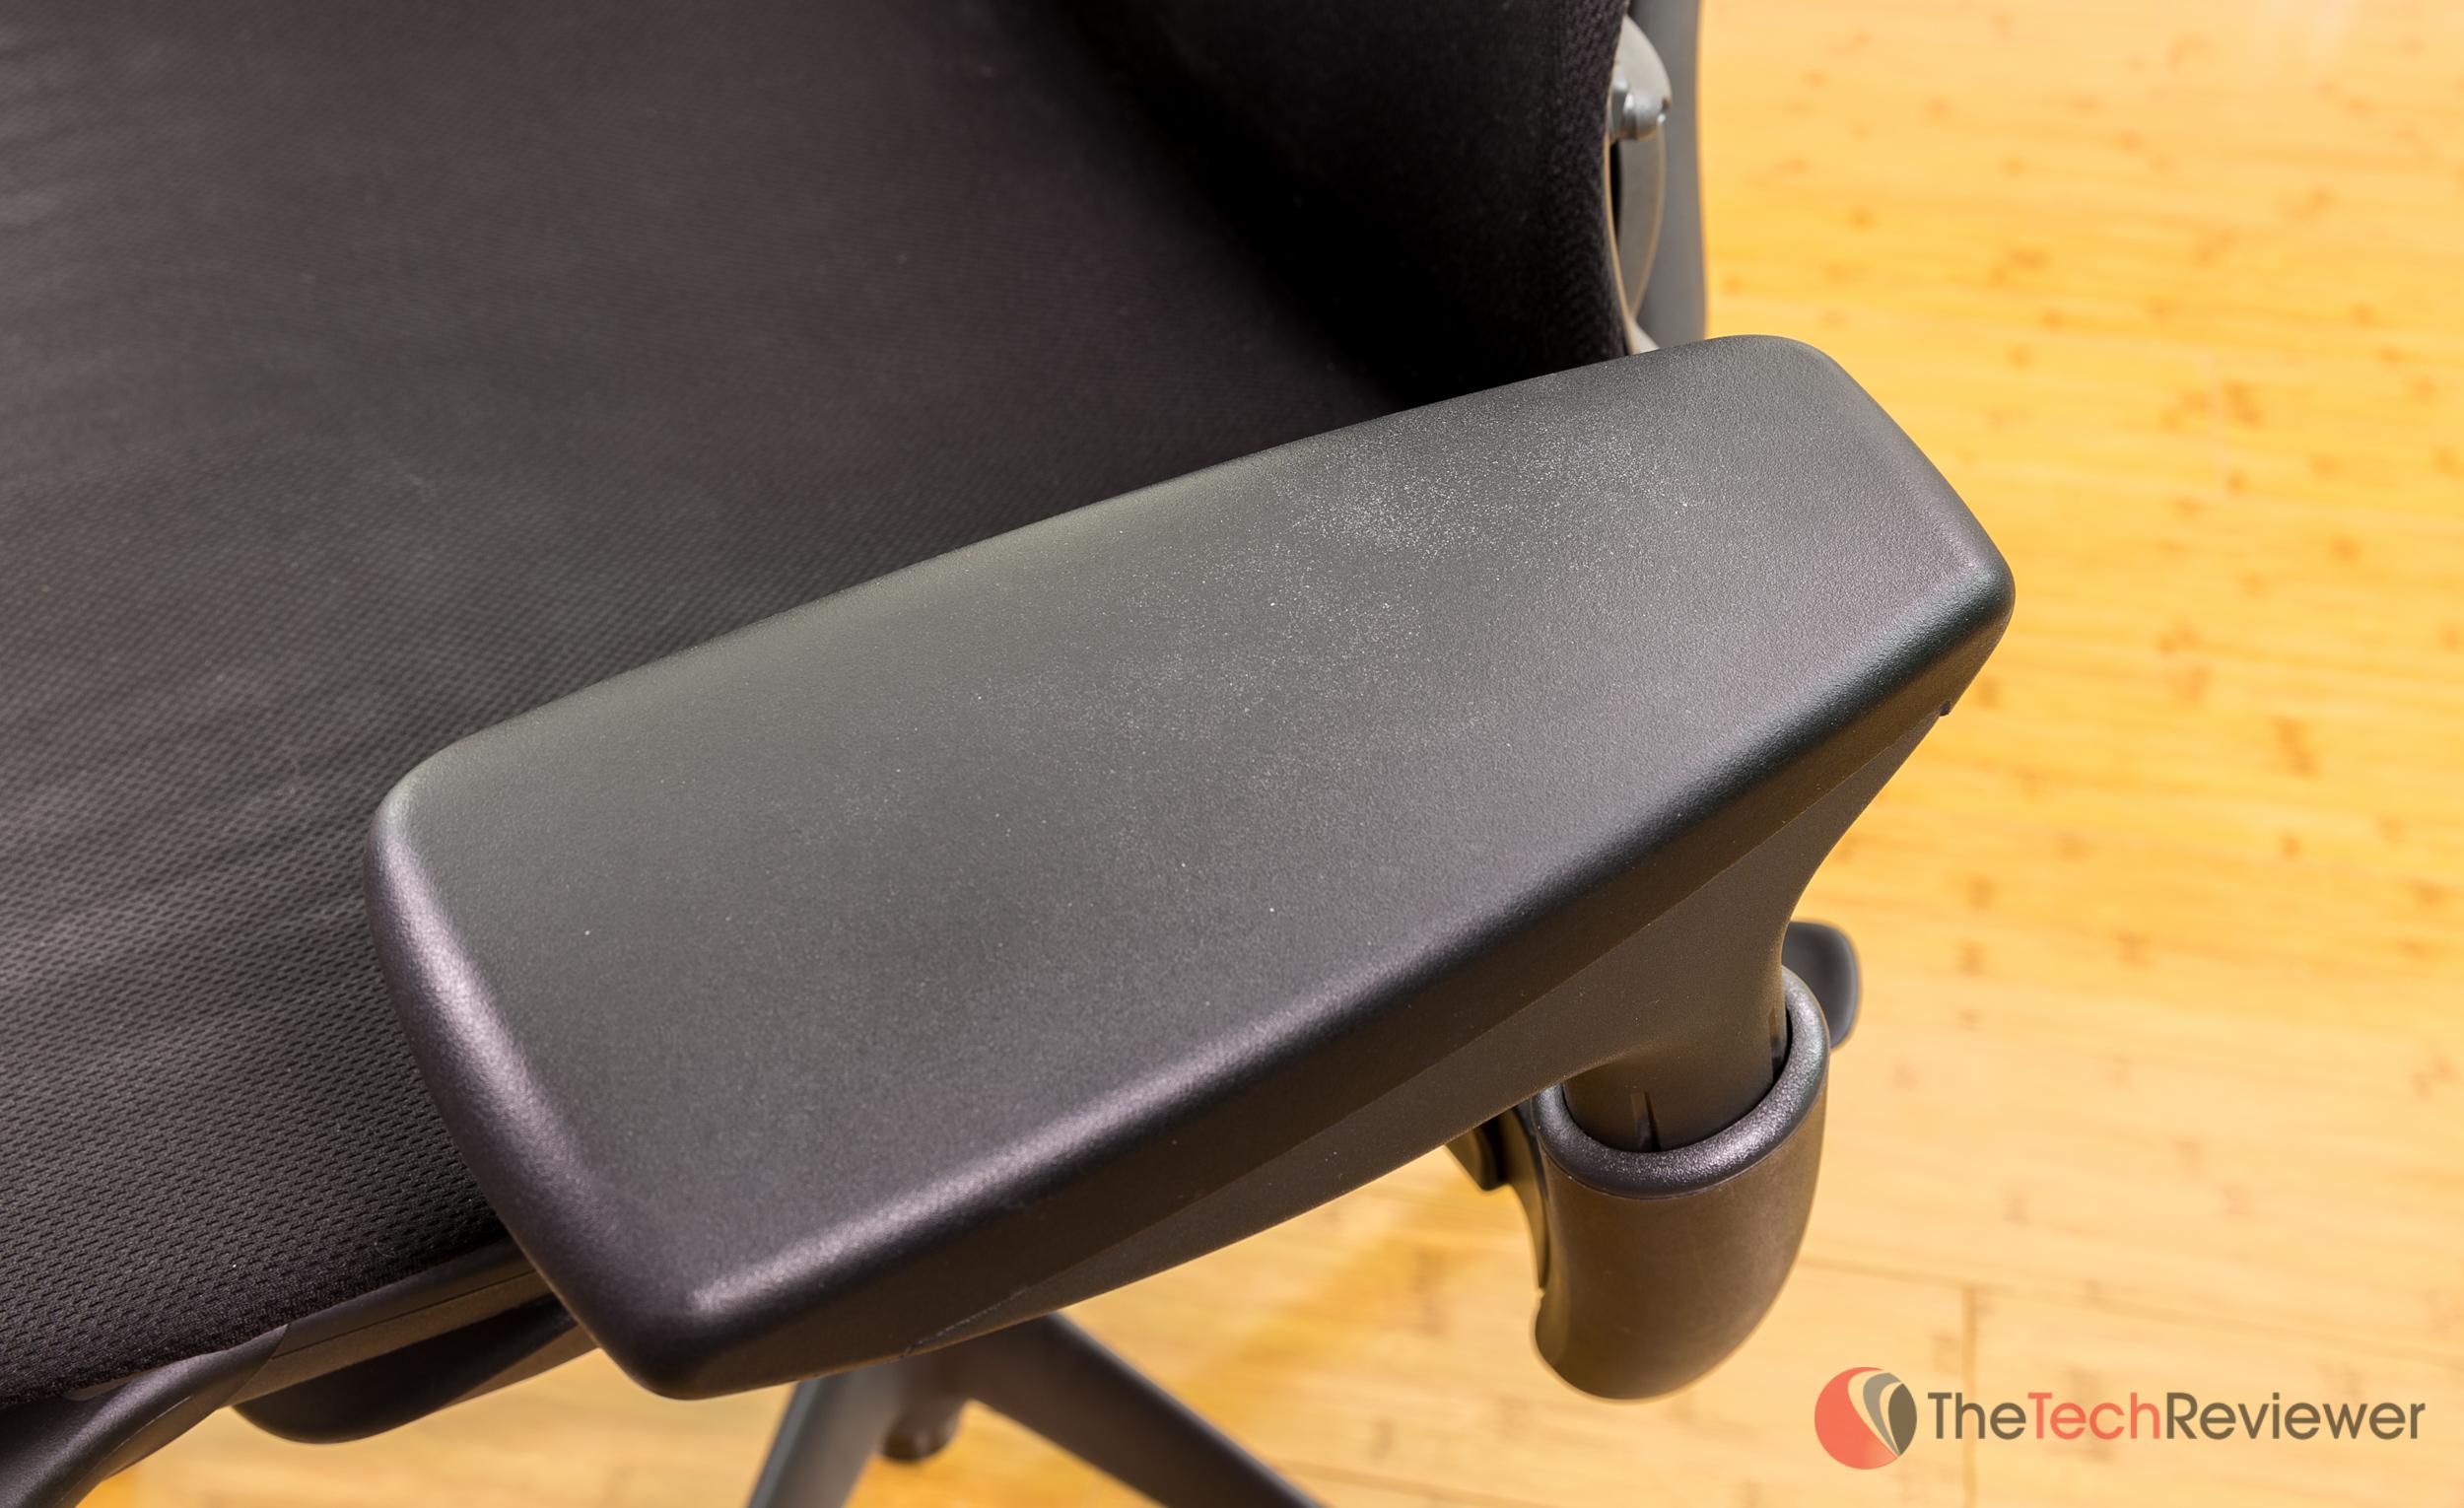 herman miller embody15 - Herman Miller Embody Chair